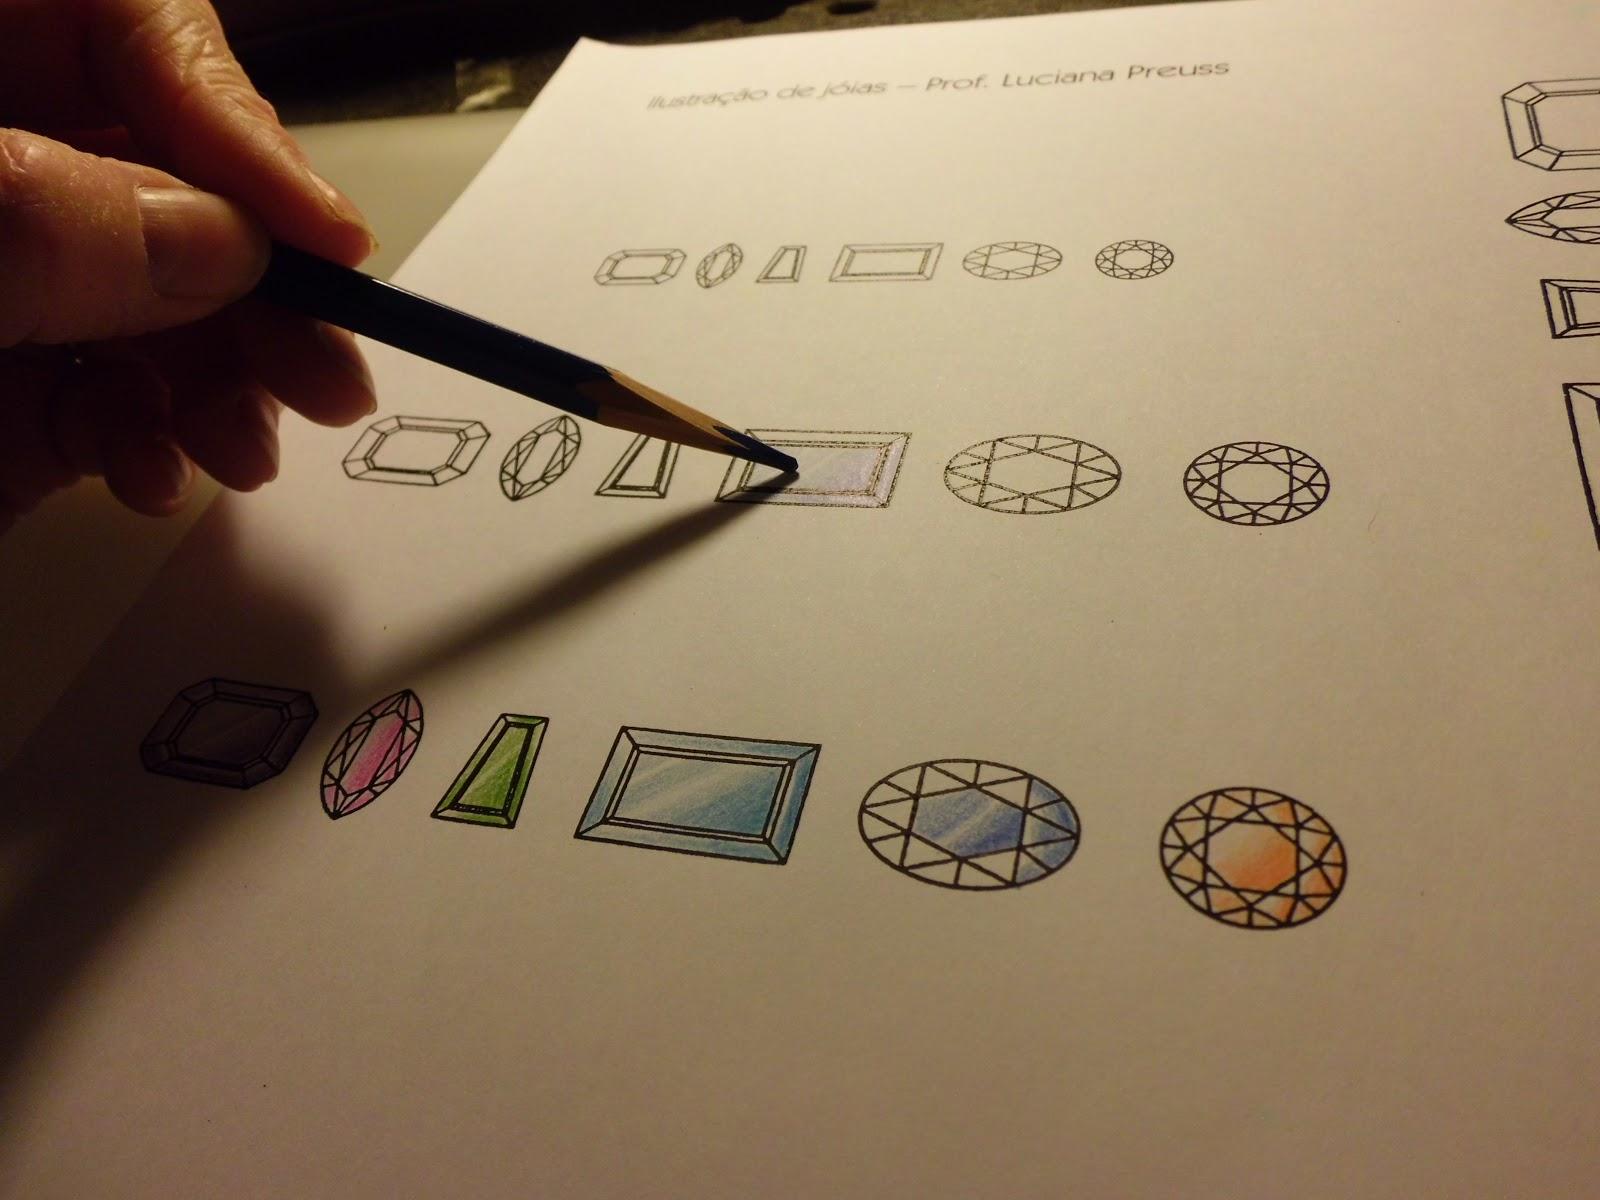 Atelier Luciana Preuss: Aprenda a desenhar gemas!